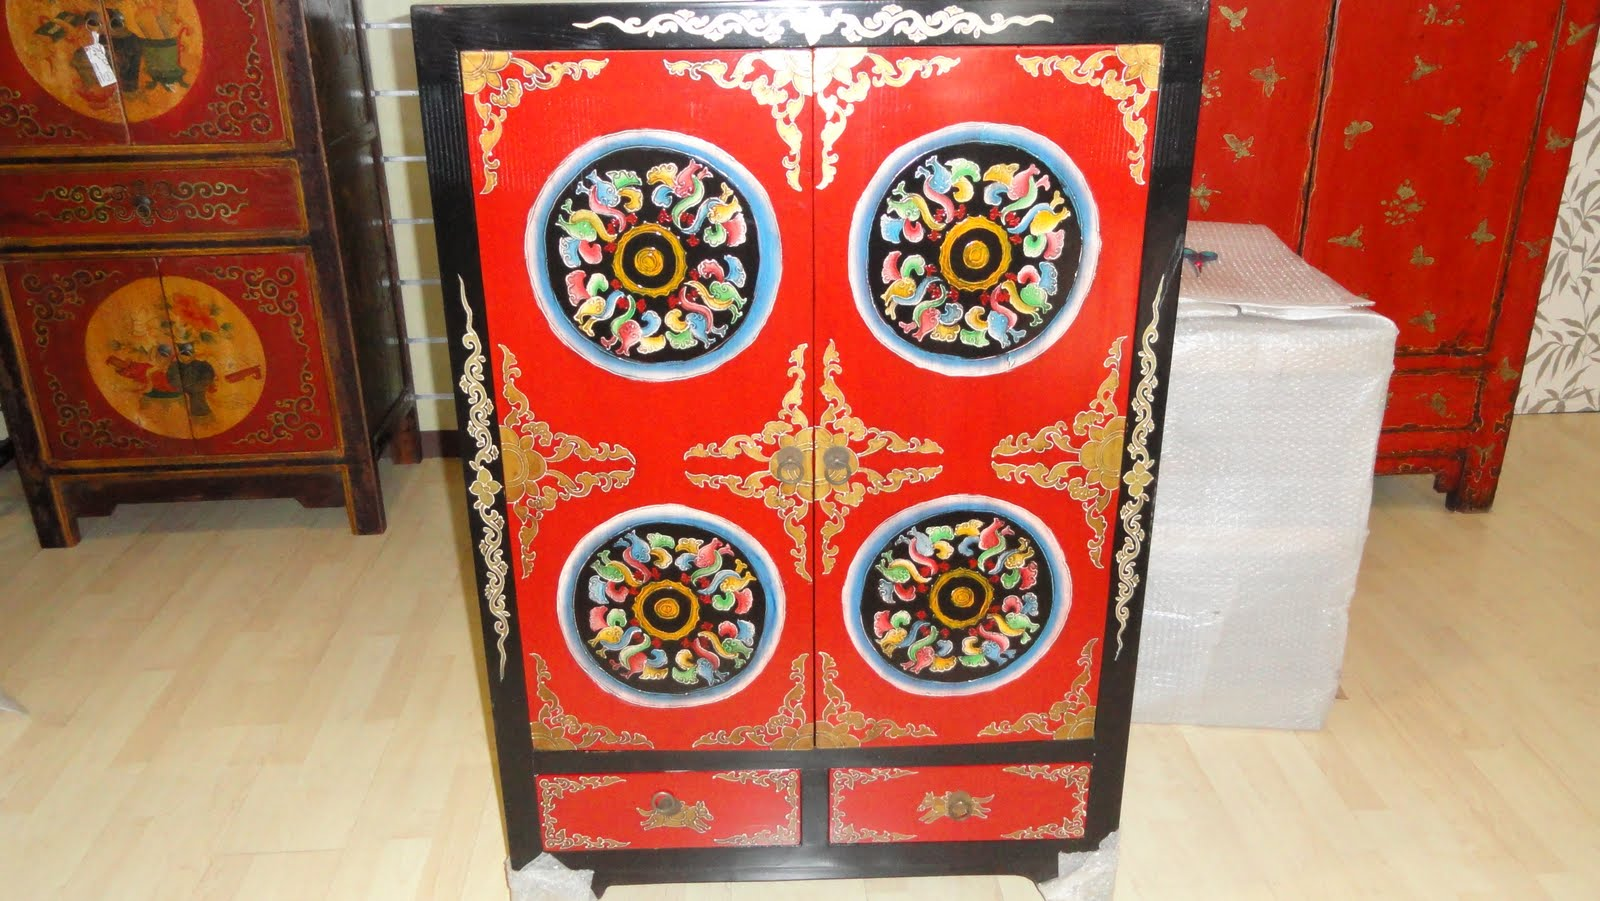 Muebles chinos y suzani mekabe home - Muebles orientales segunda mano ...